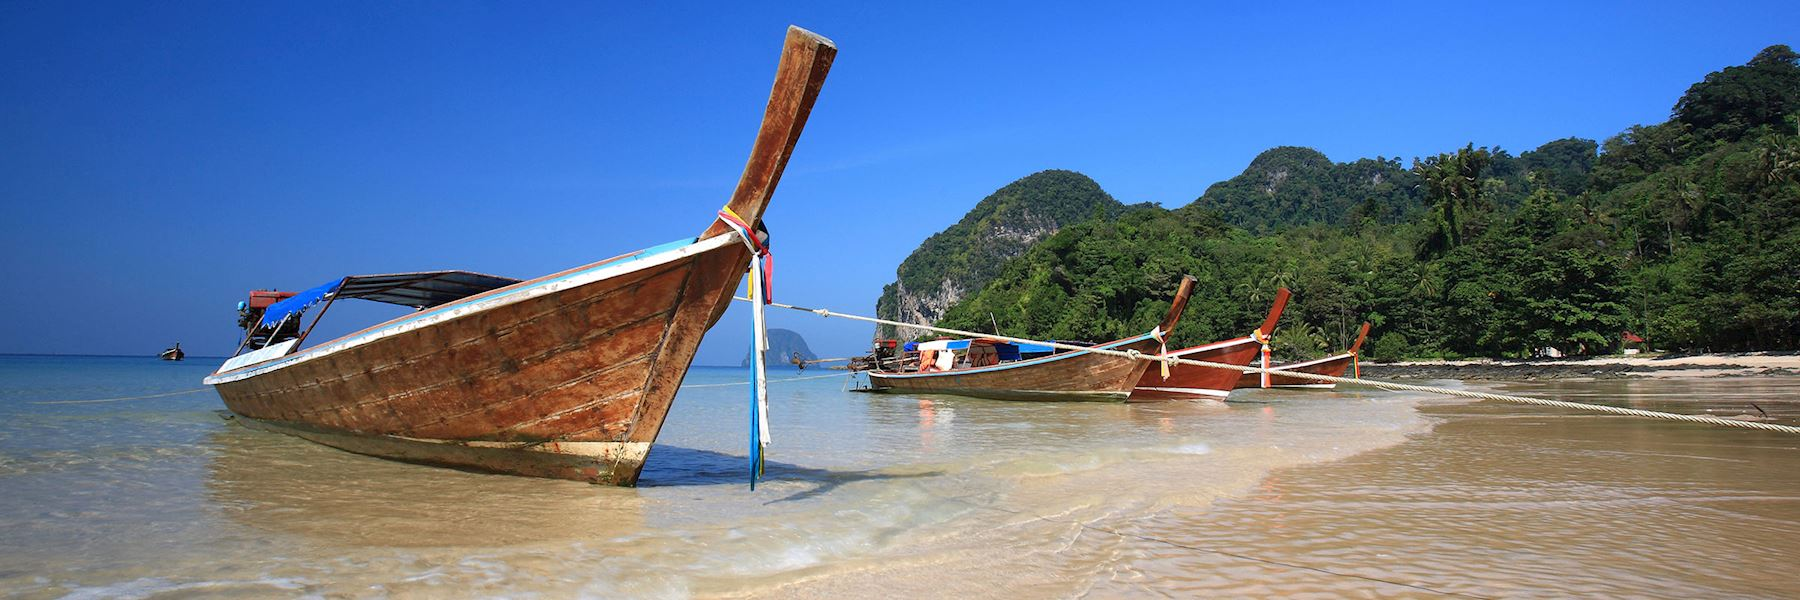 Thailand holidays  2019 & 2020